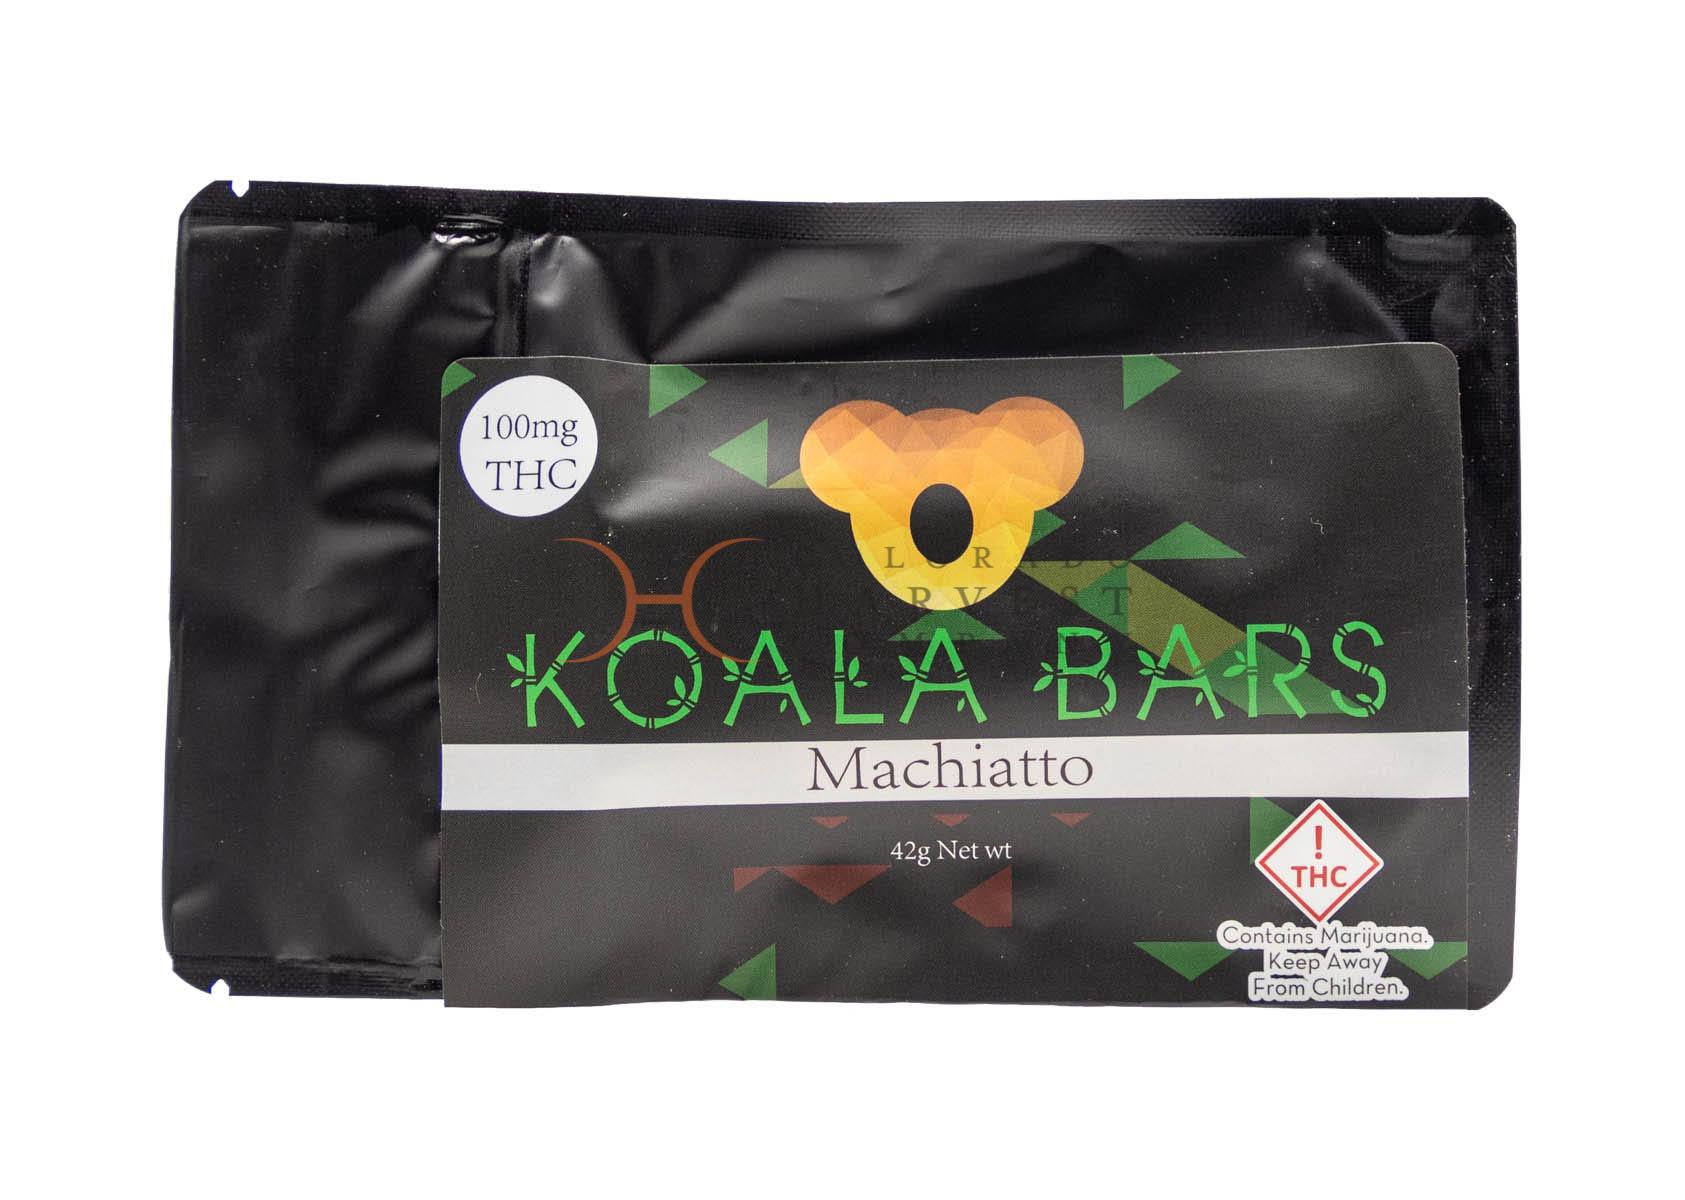 Koala Bar - Machiatto